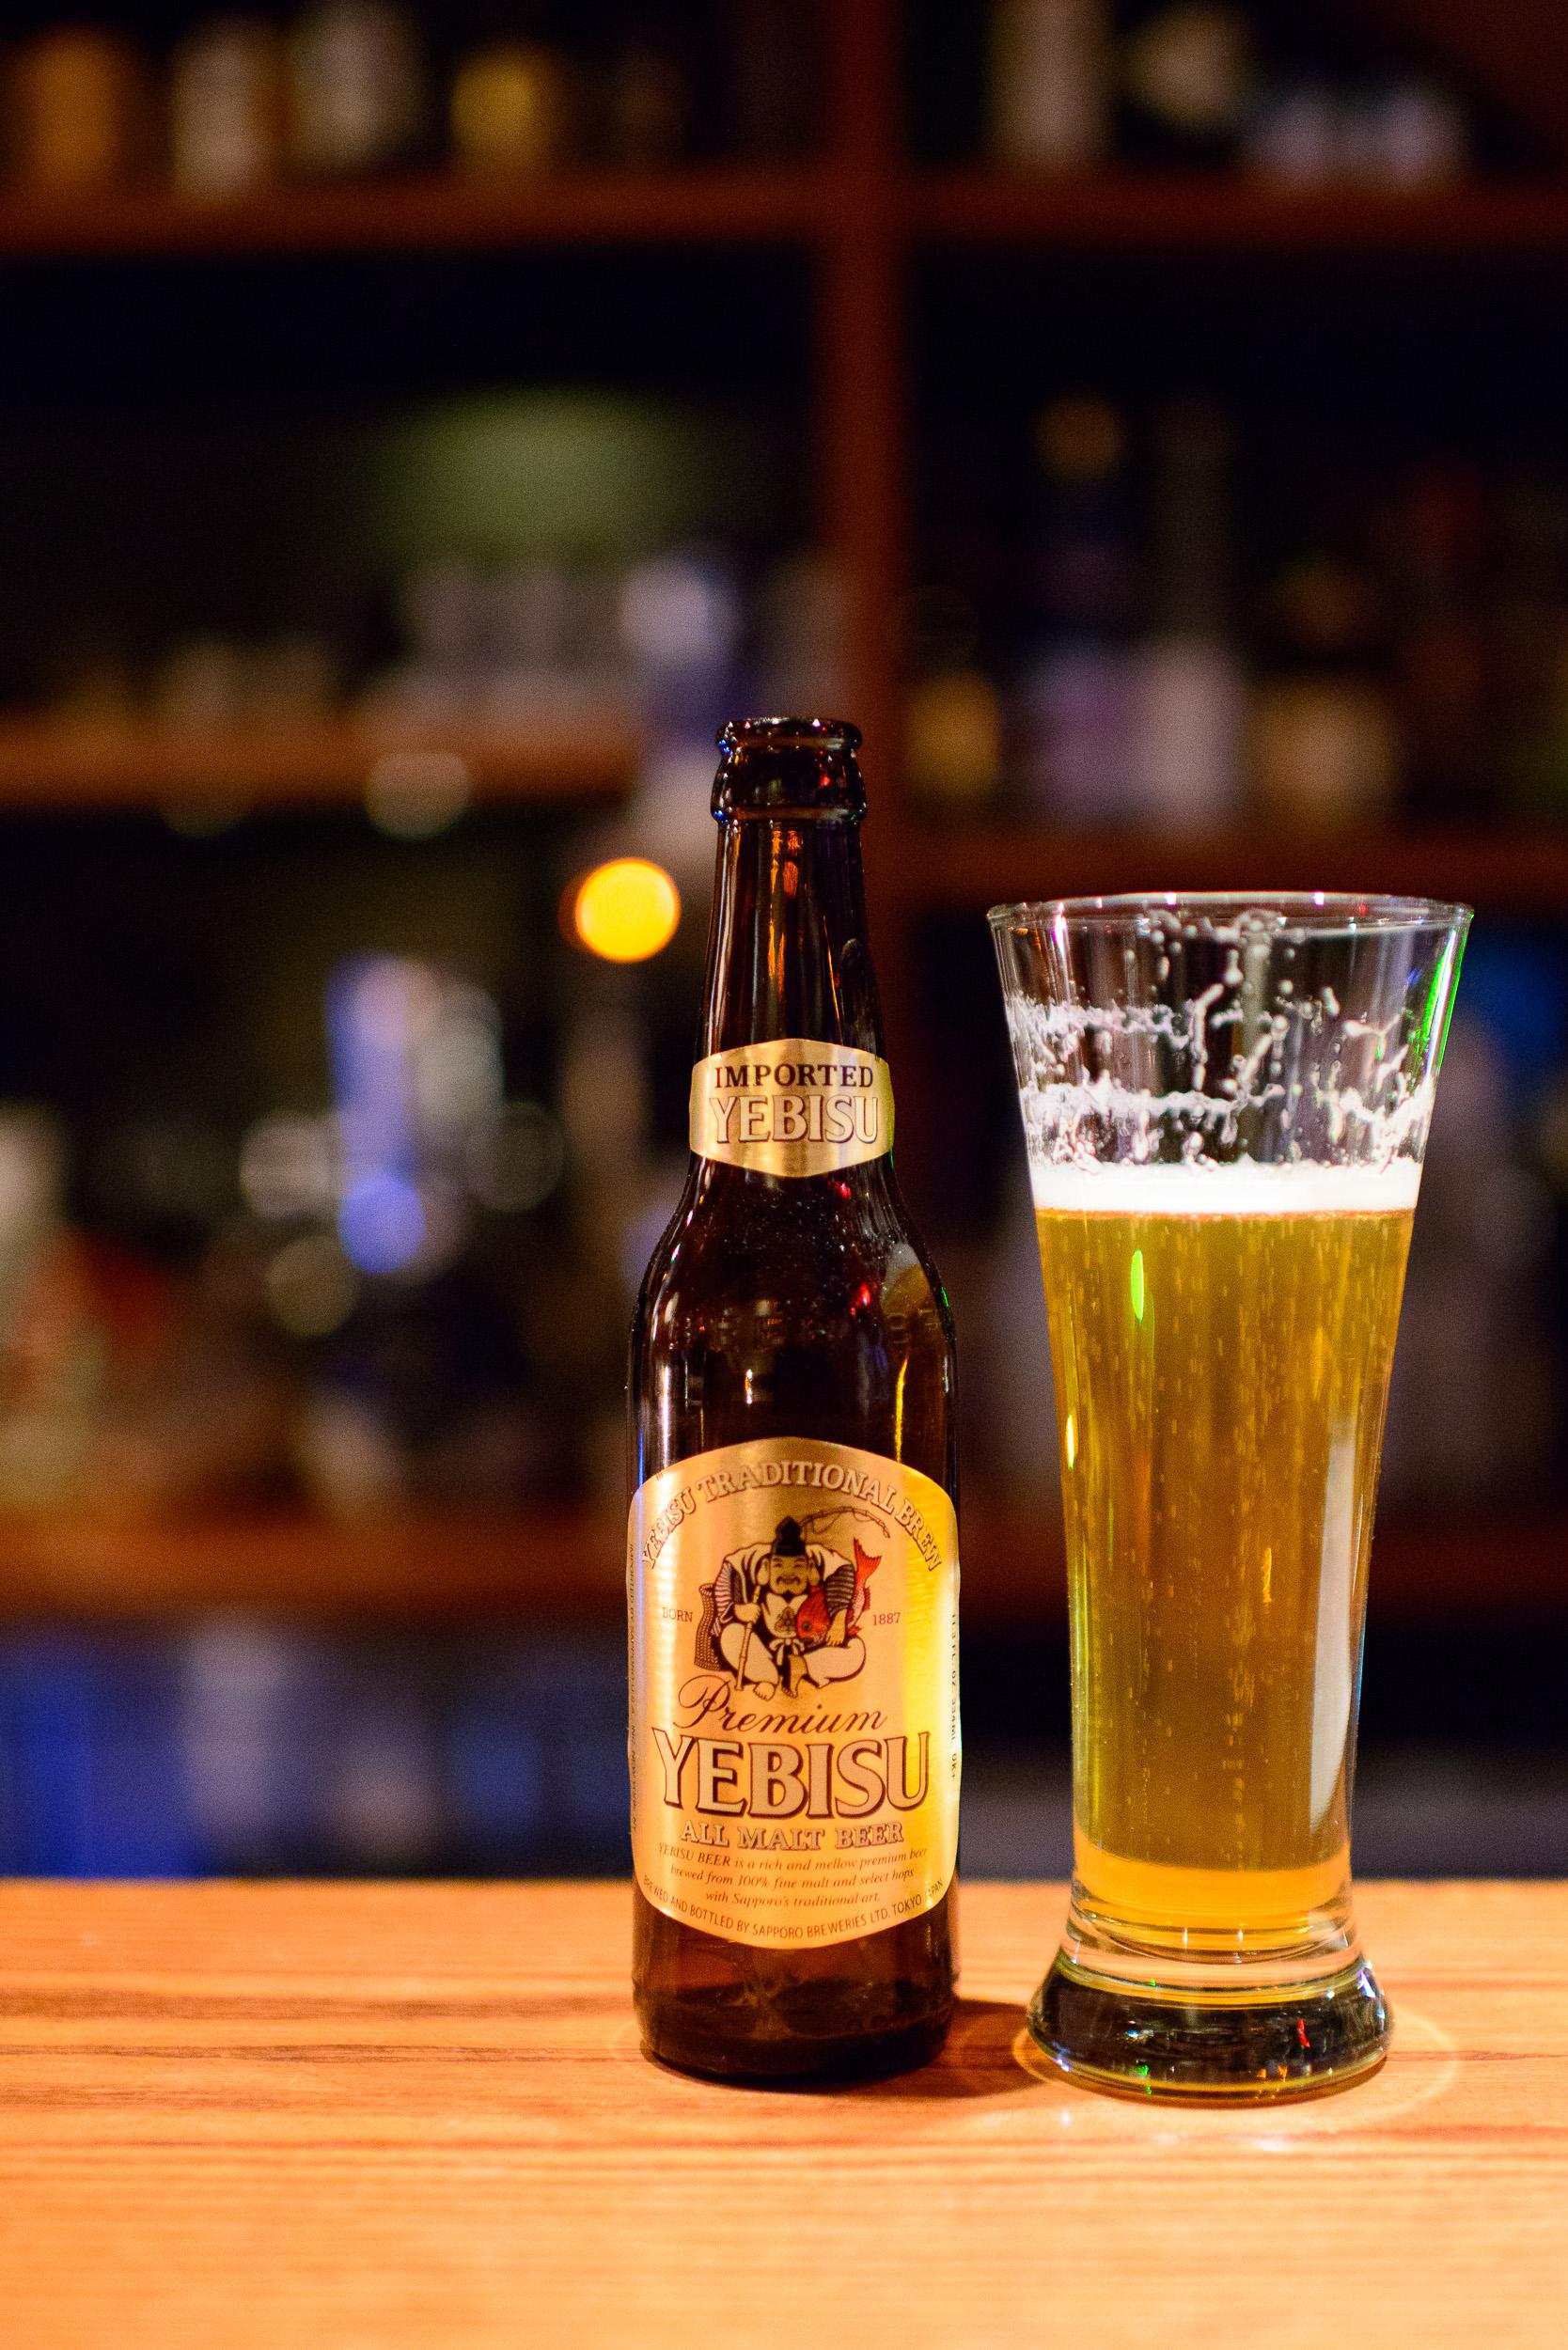 Yebisu All Malt Beer